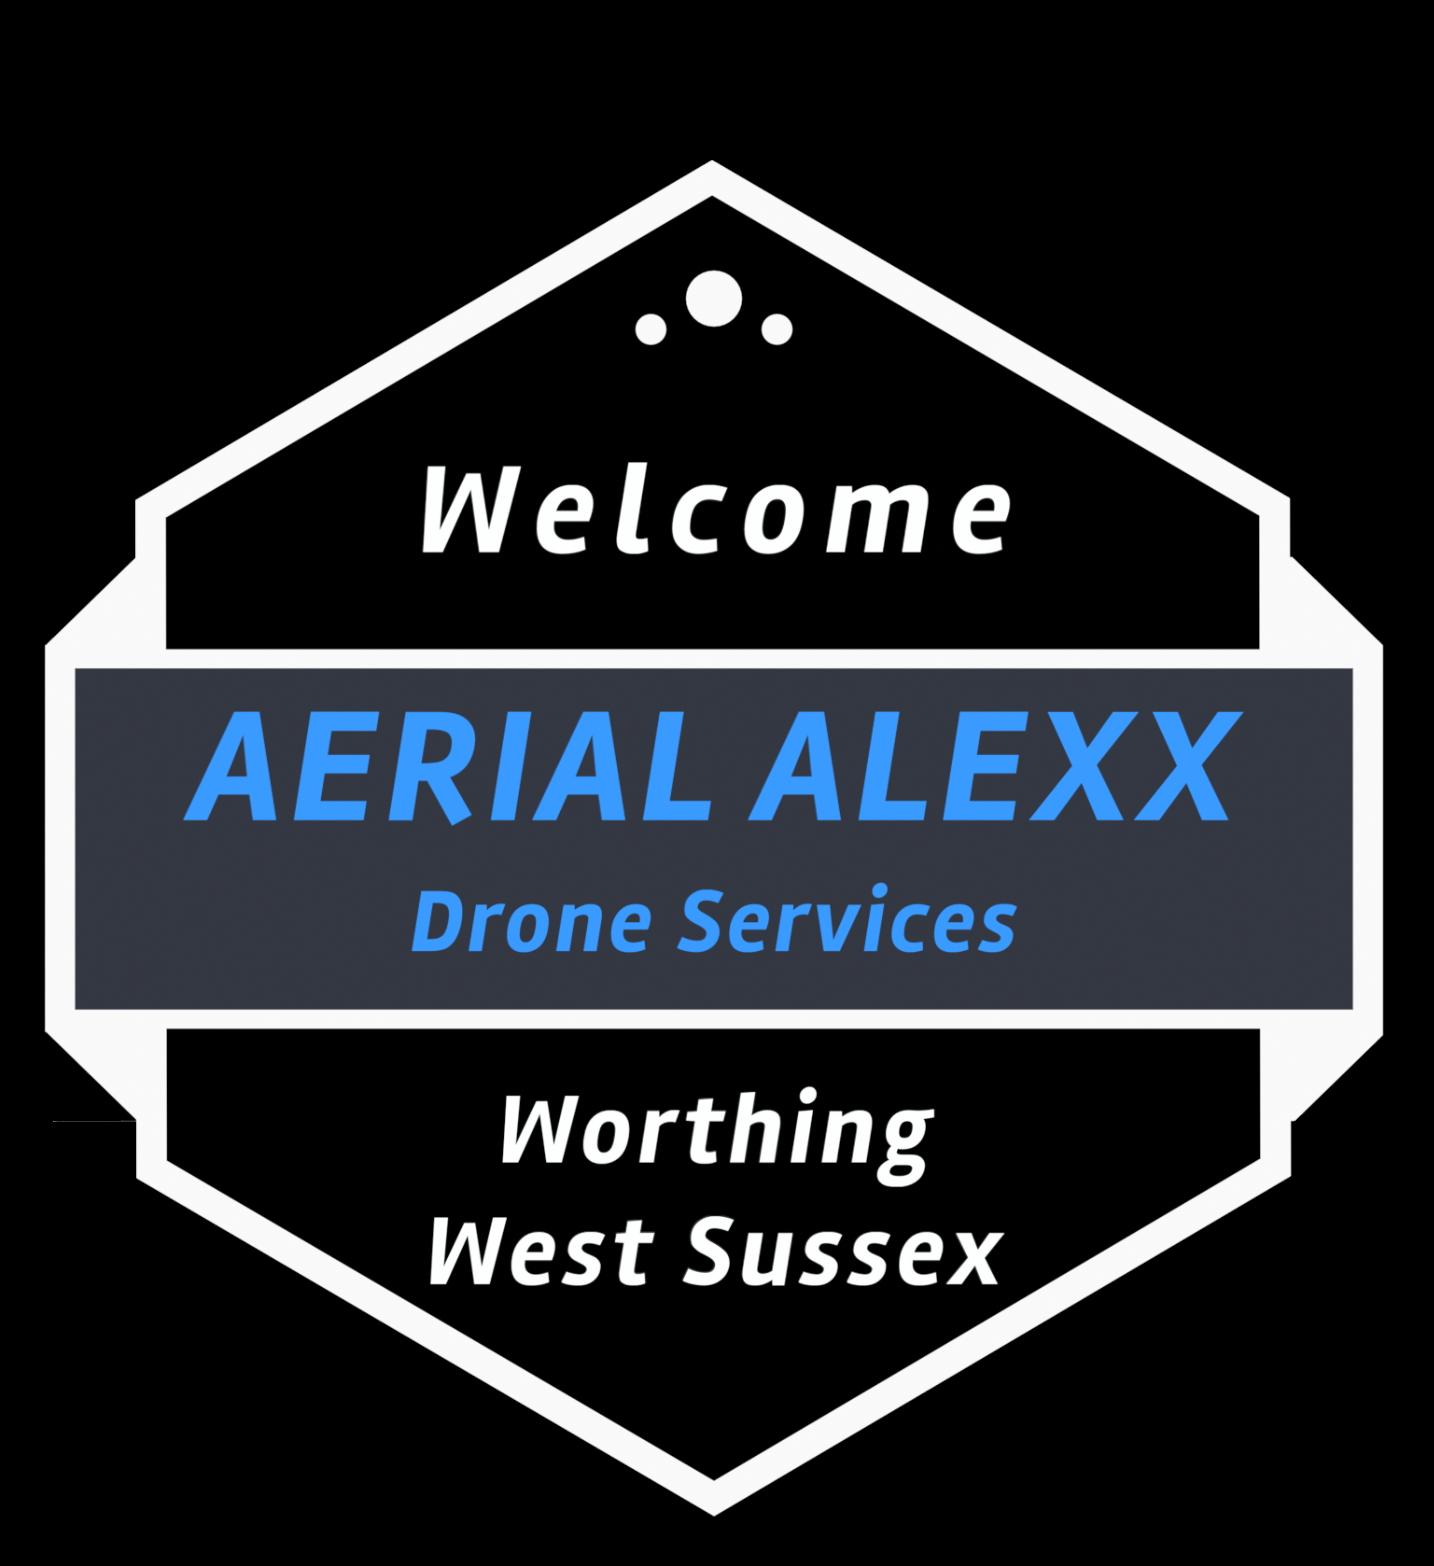 Aerial Alexx Drone Services